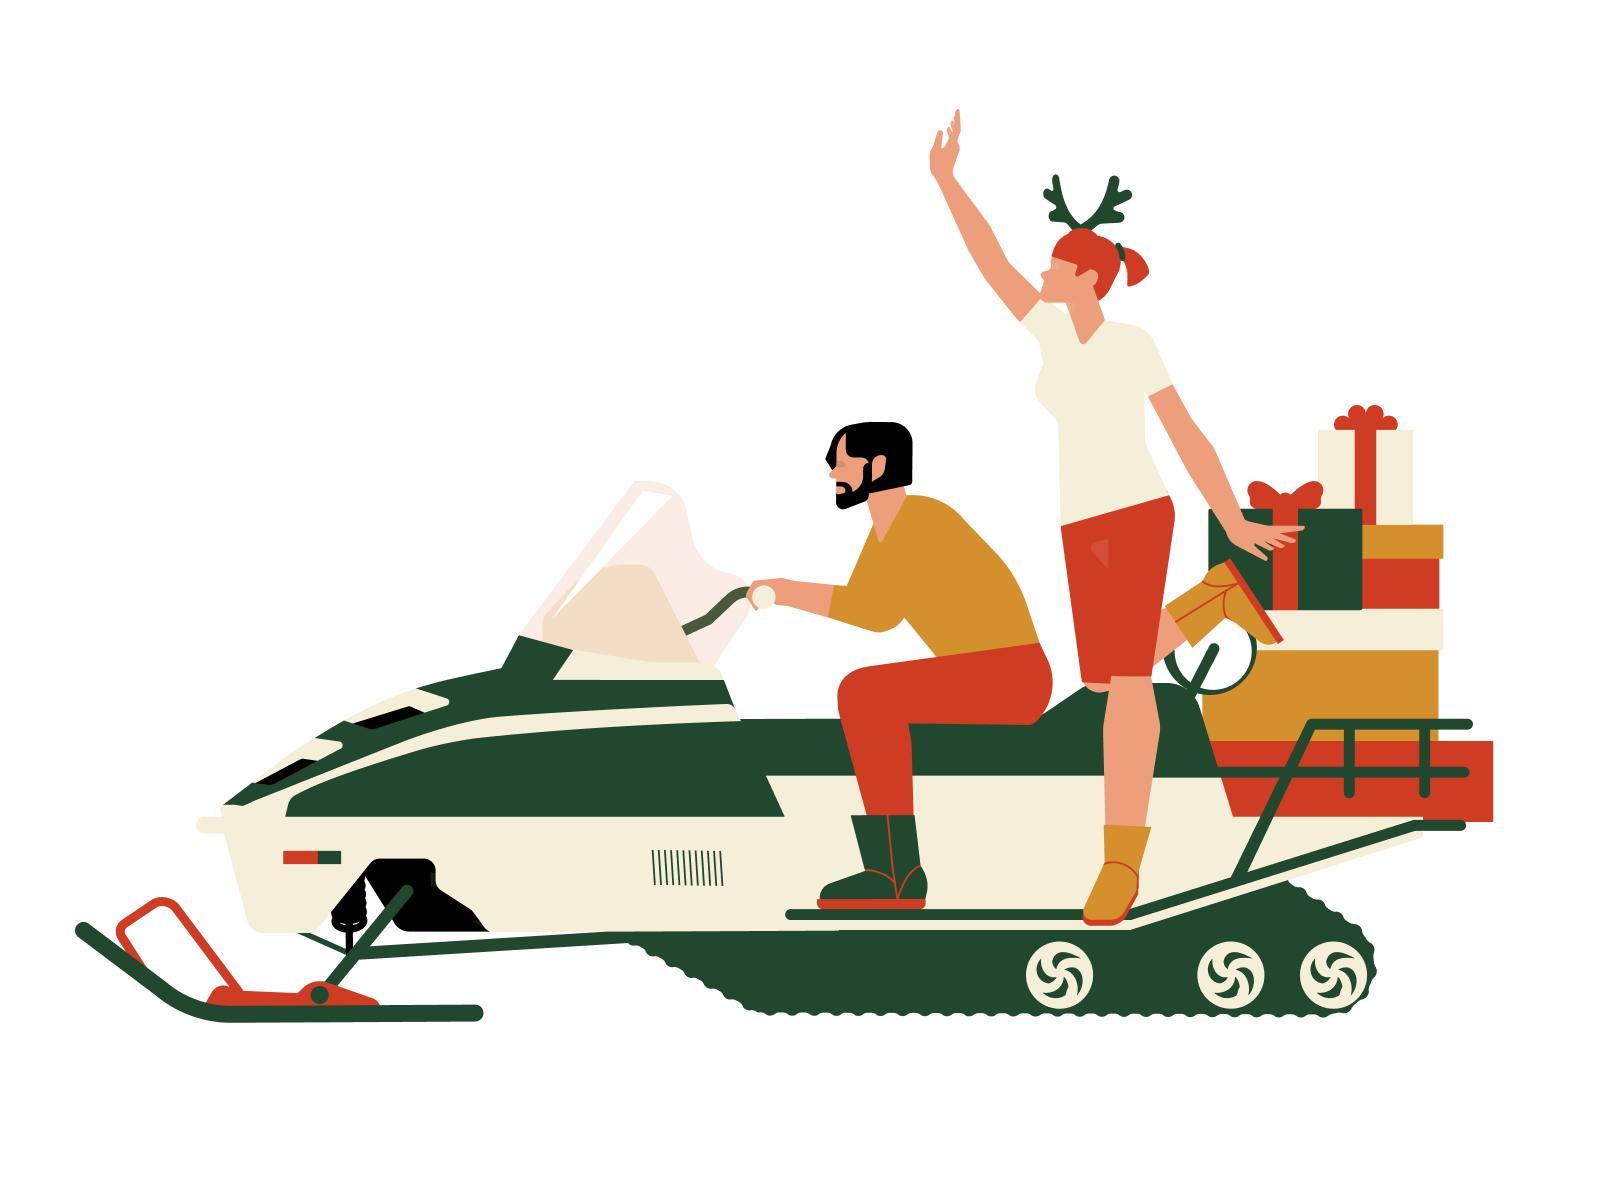 icons8 christmas illustration travel